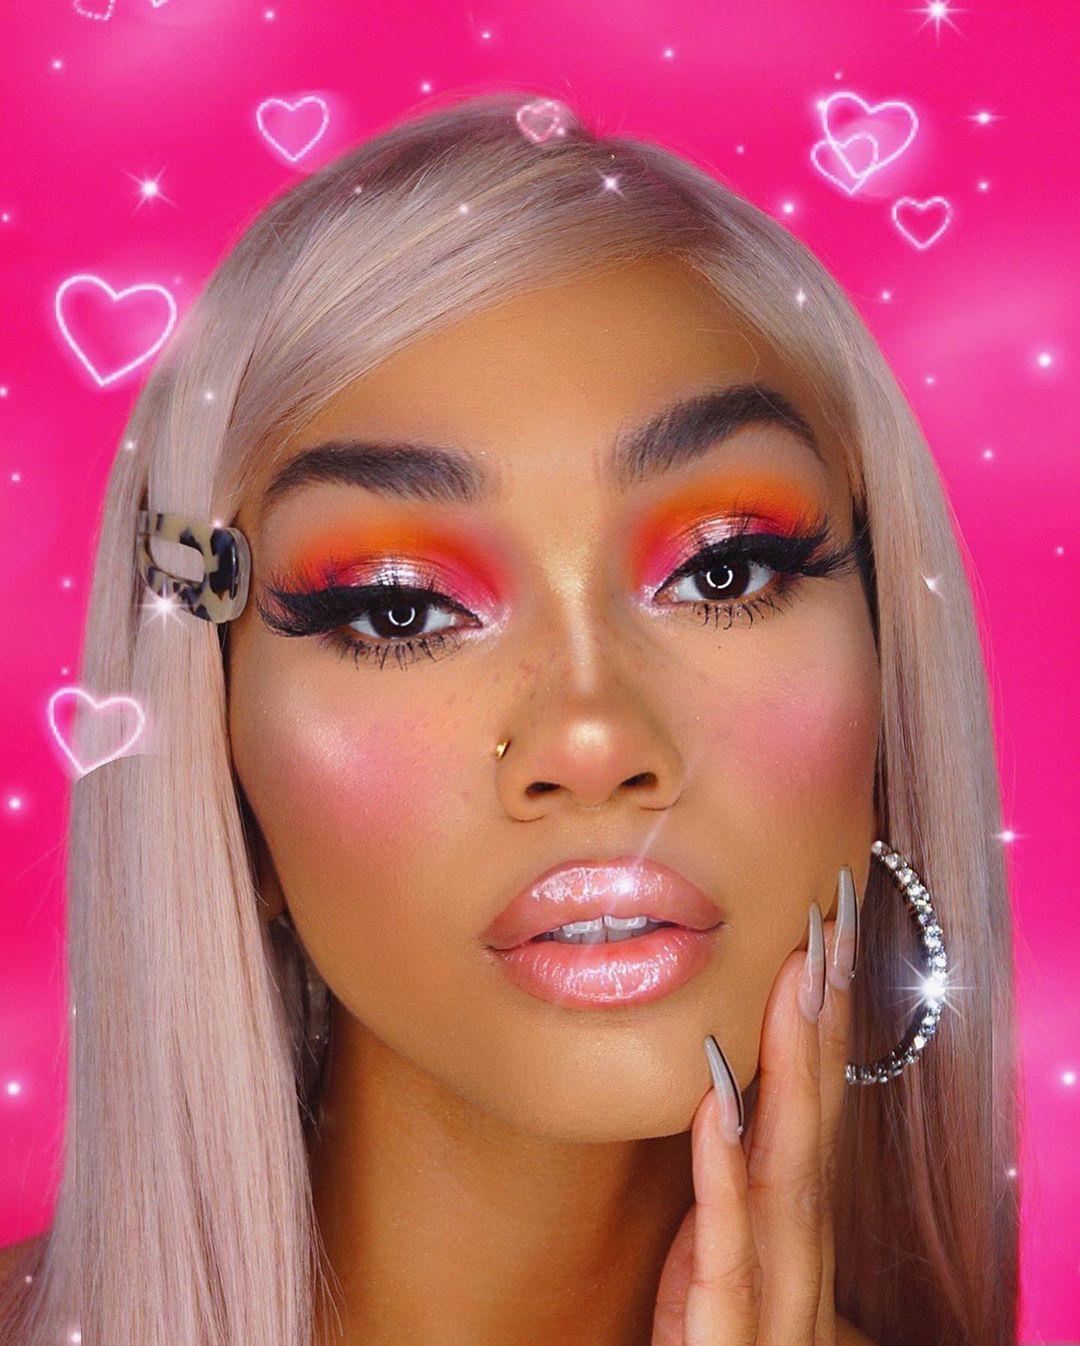 Maquiagem sombra neon laranja